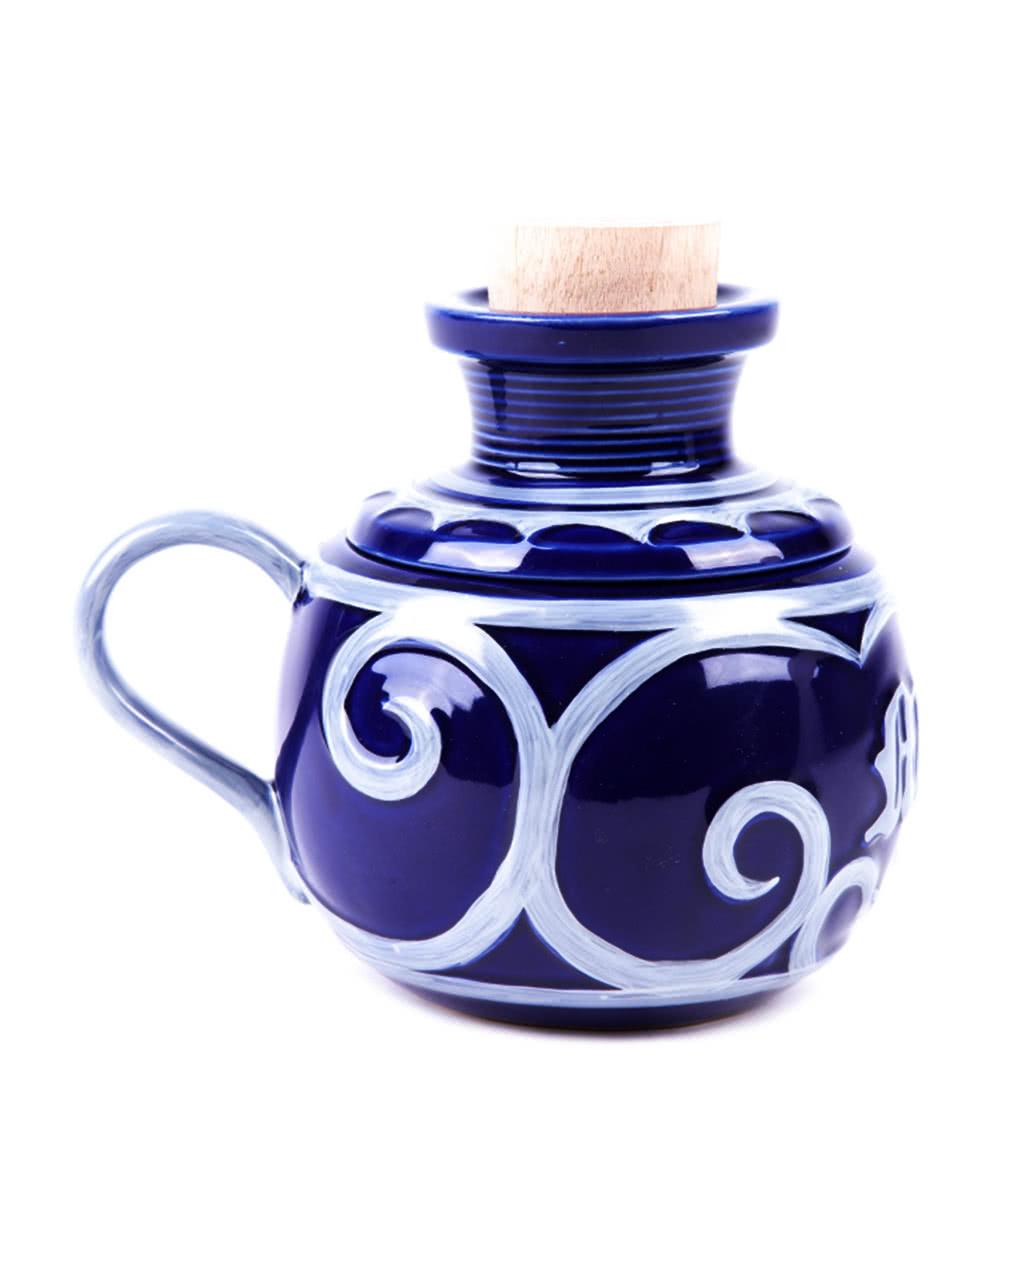 mana potion coffee mug as a gift item horror. Black Bedroom Furniture Sets. Home Design Ideas